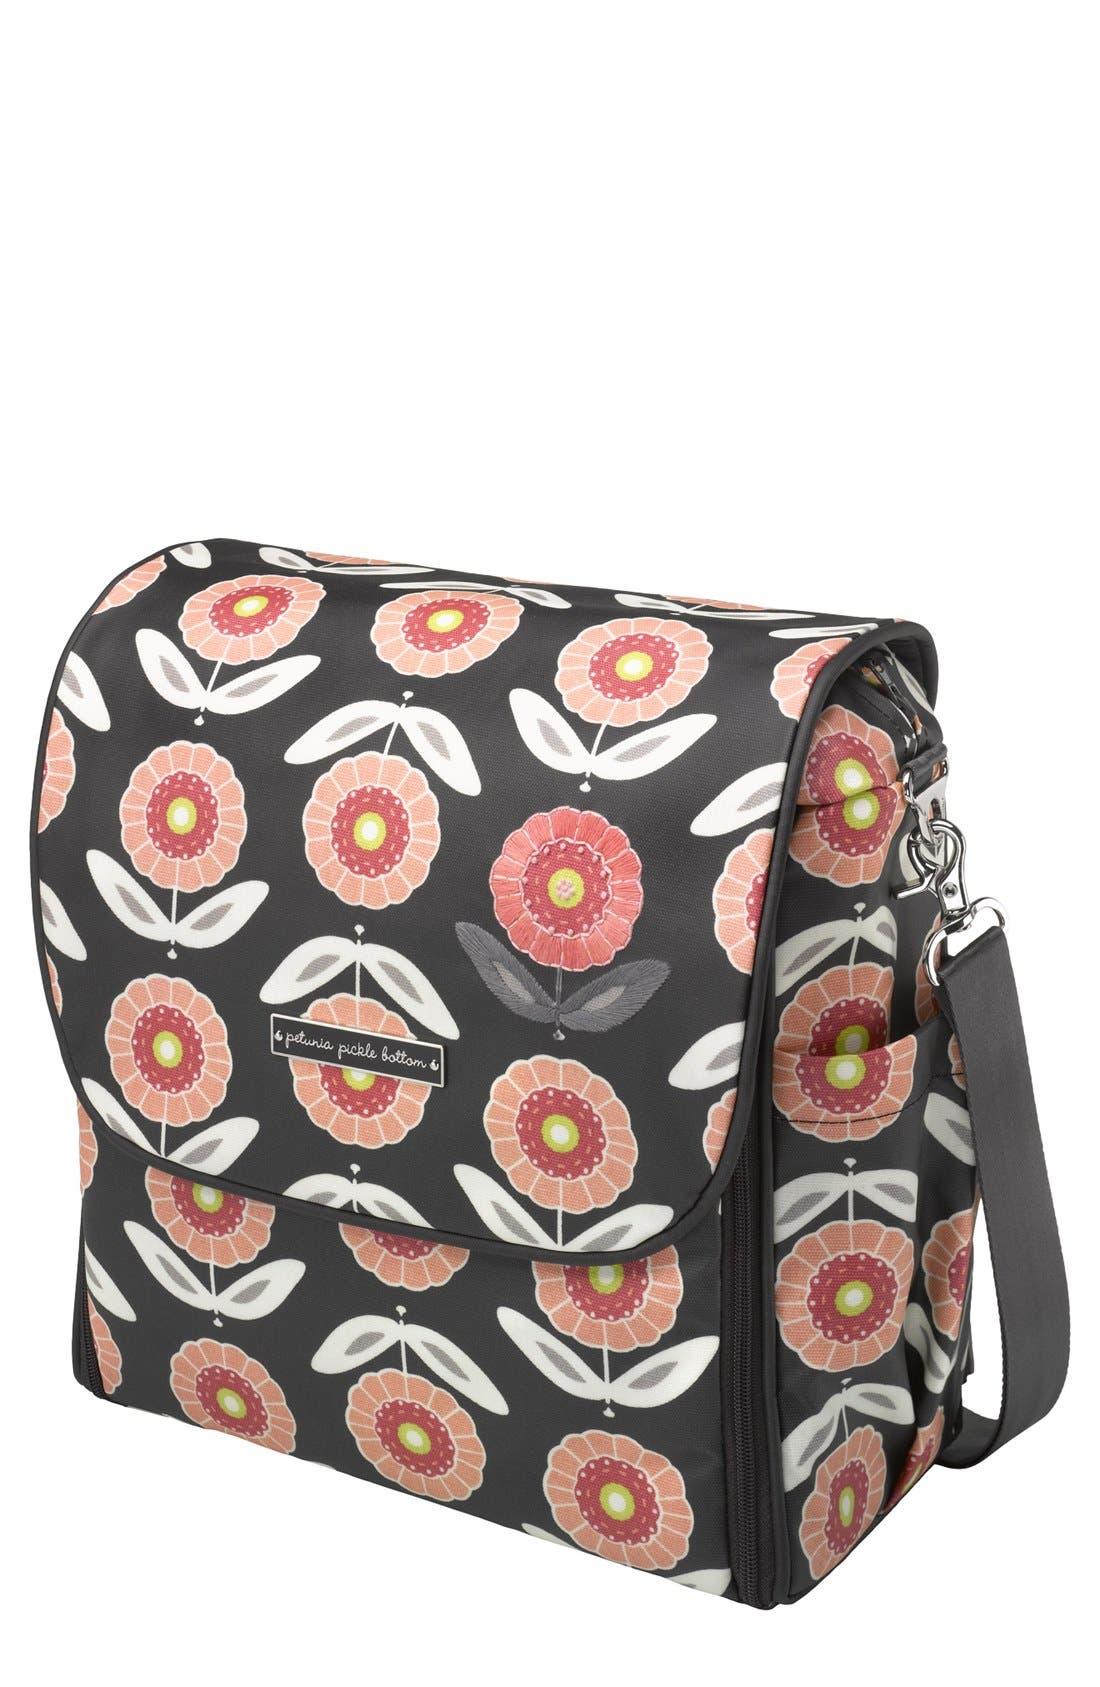 Alternate Image 1 Selected - Petunia Pickle Bottom 'Boxy Glazed' Backpack Diaper Bag